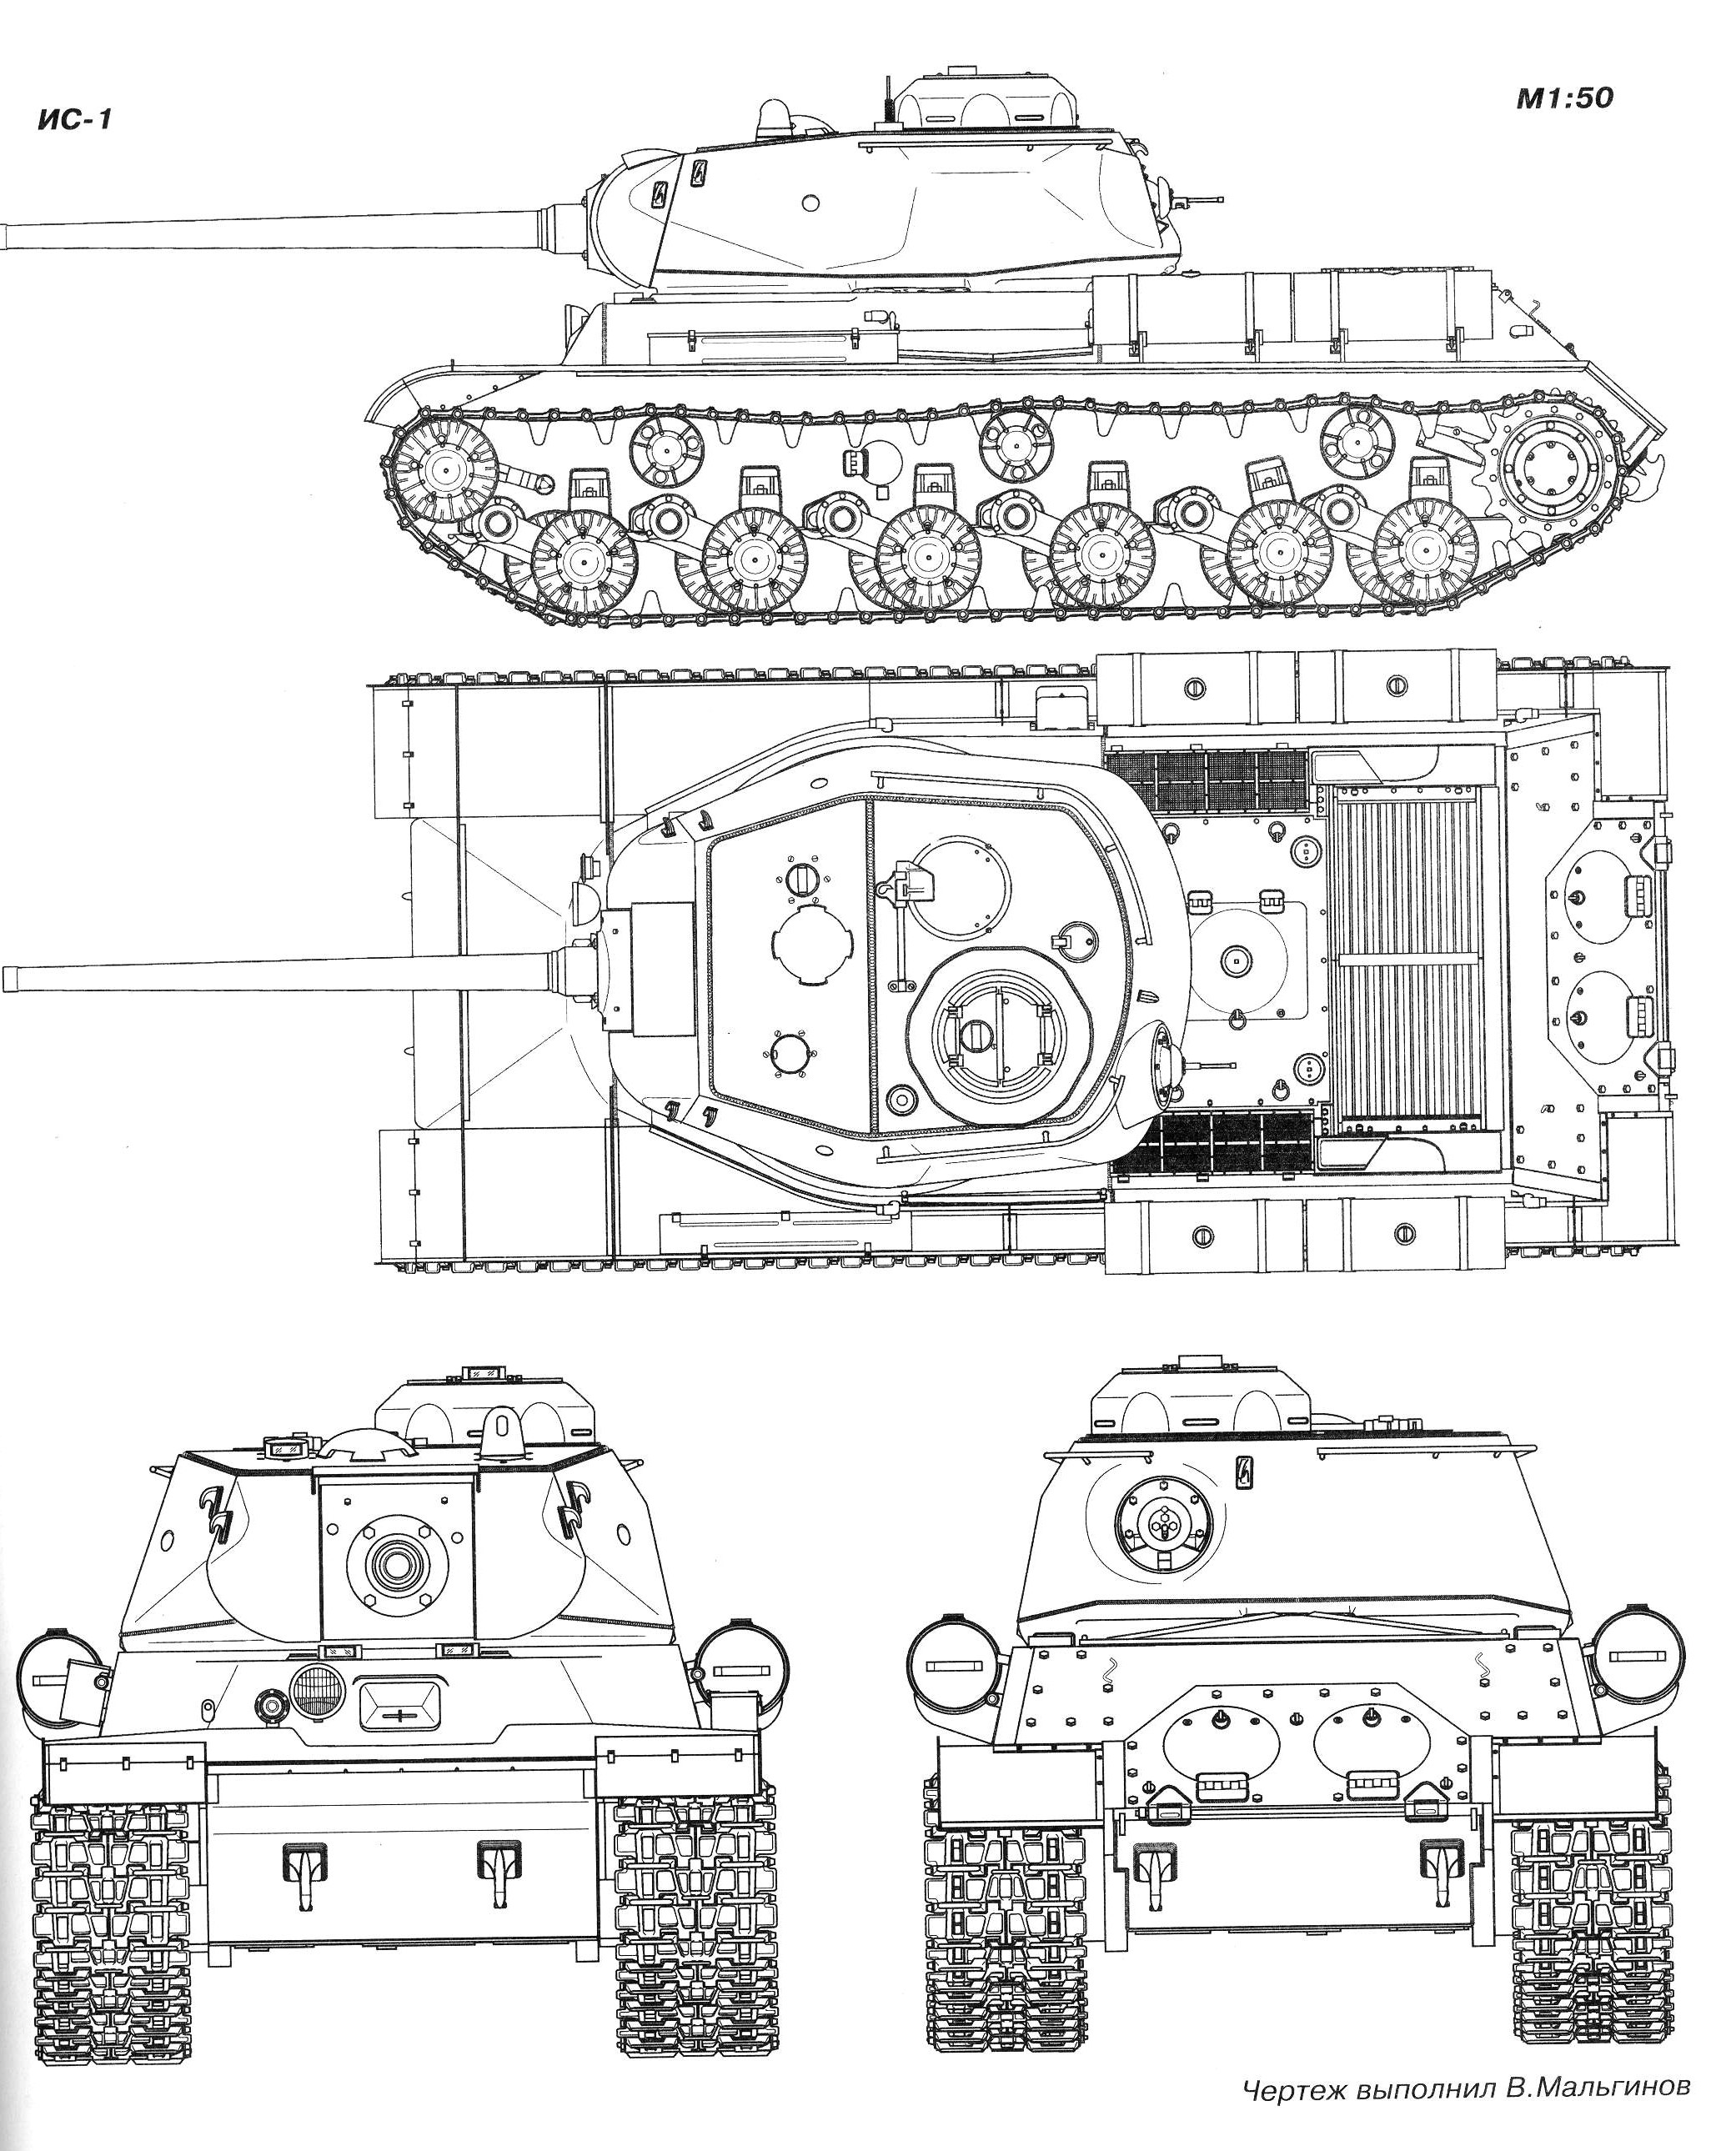 IS-1 (IS-85). Blueprints